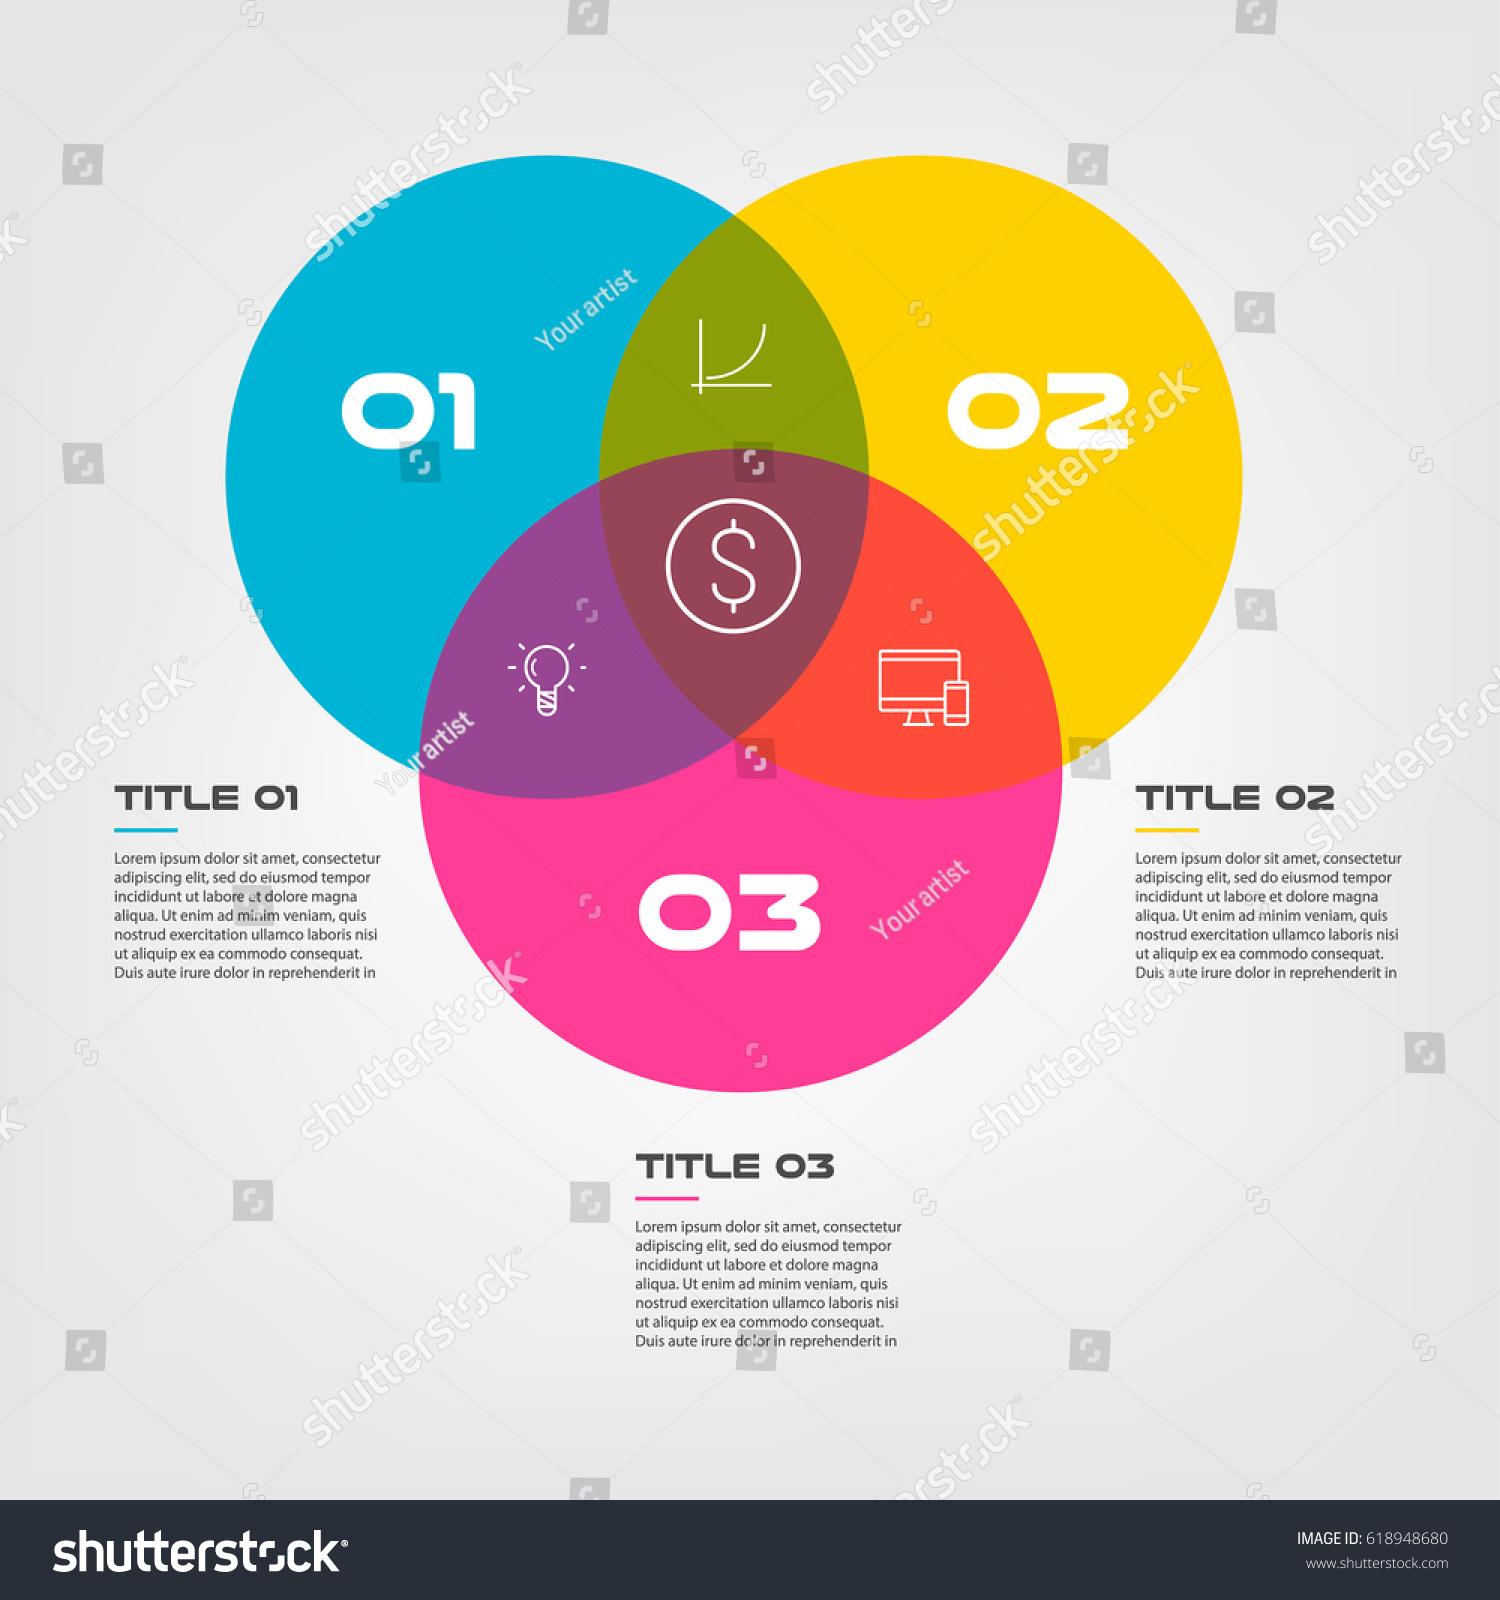 vector venn diagram of lymph nodes in groin infographics three circle design stock